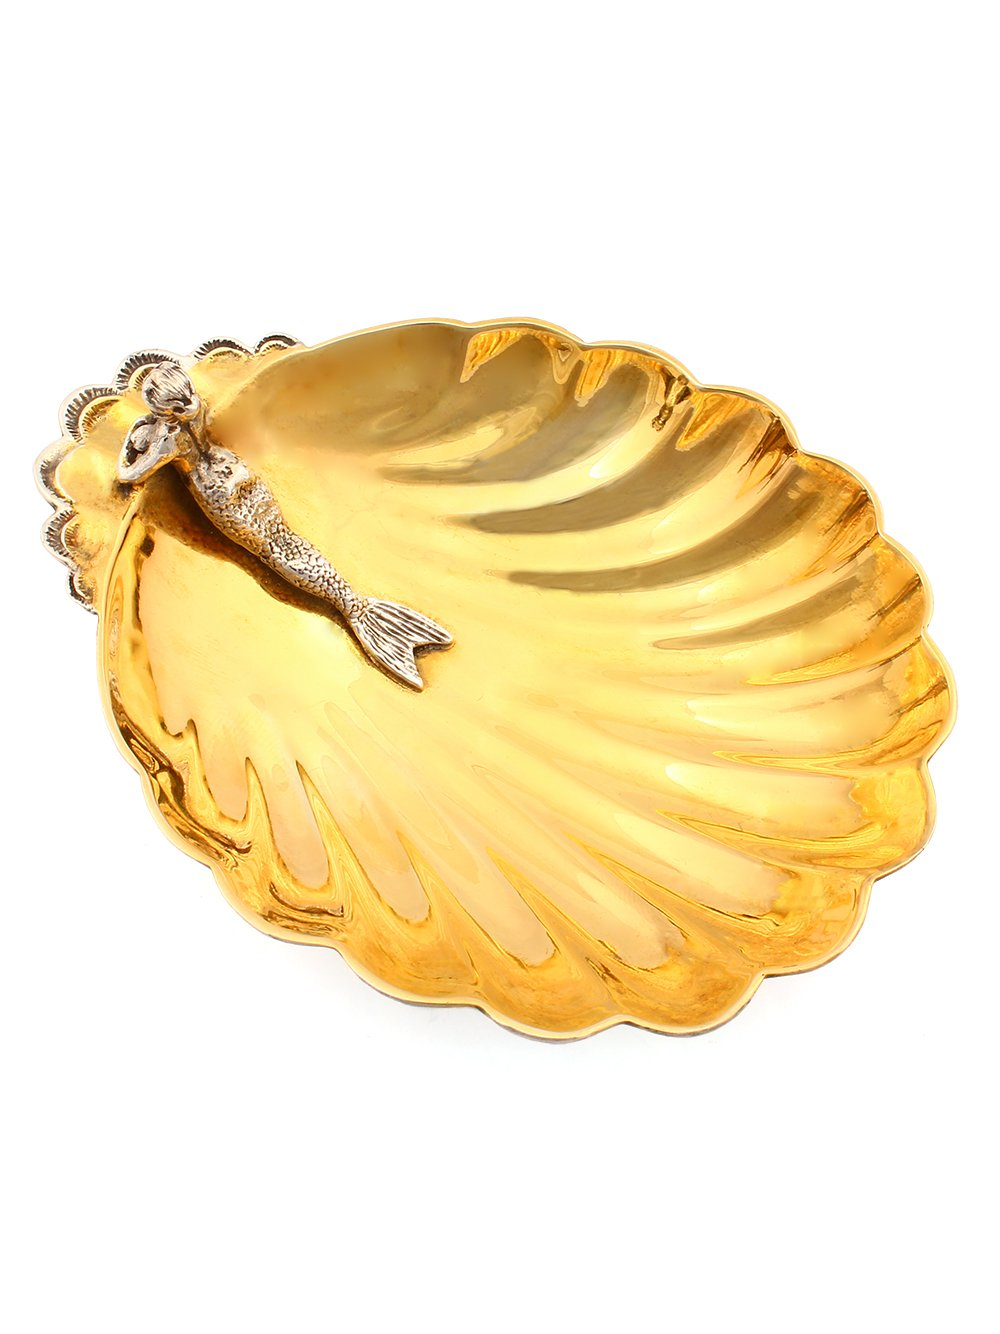 "Silver caviar plate ""Mermaid"" 1115"